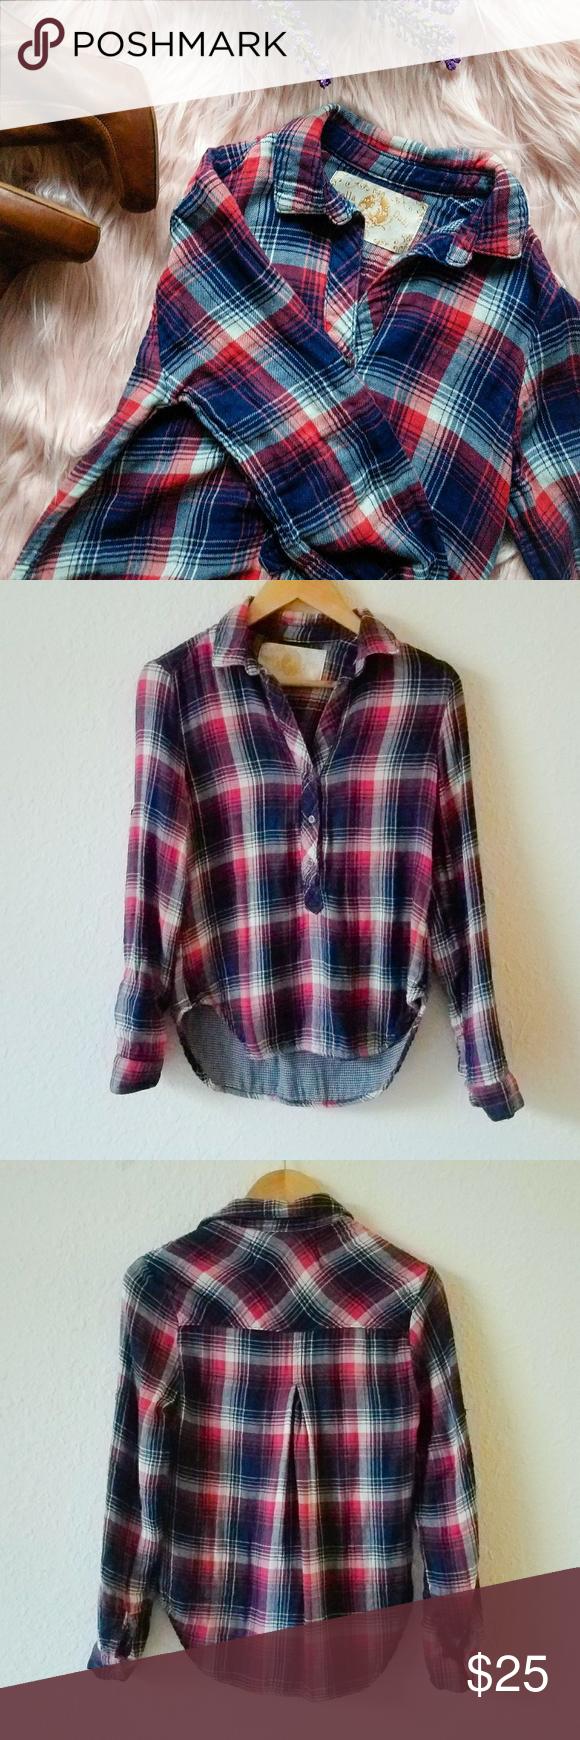 Red flannel 2018  Anthropologie Bella Flannel Plaid Shirt in   My Posh Picks